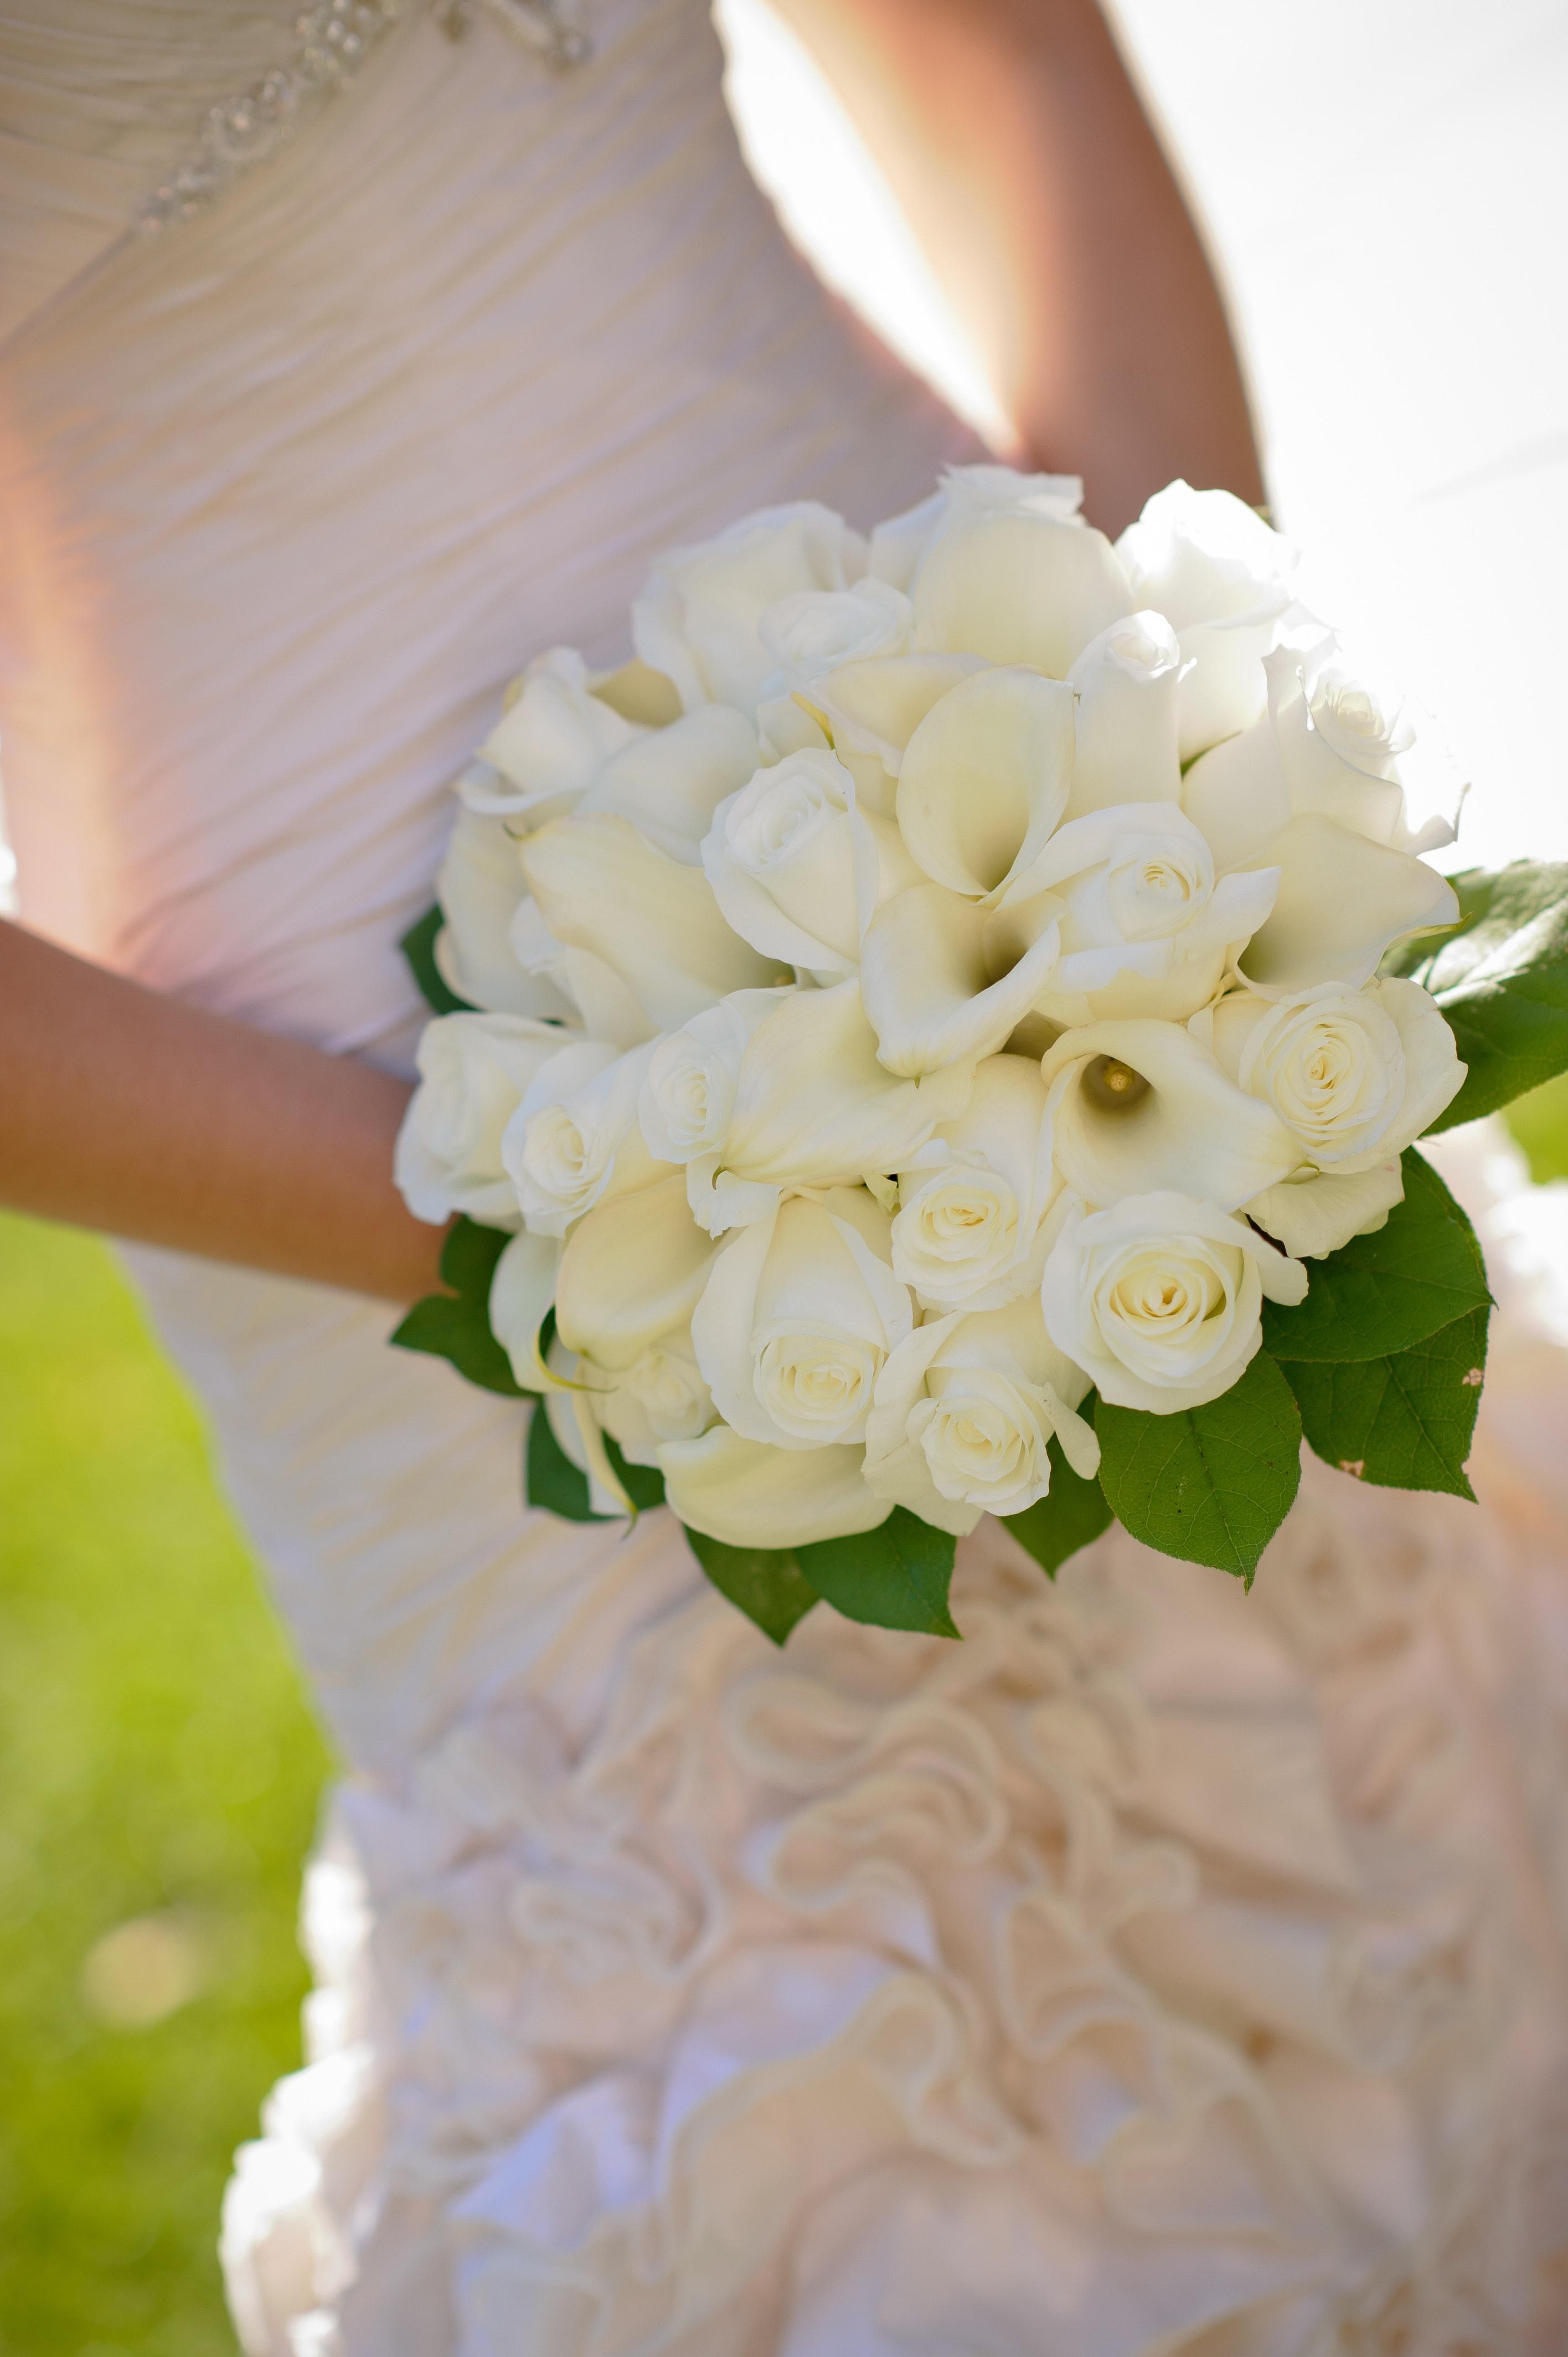 Woman in wedding dress holding white flower bouquet free stock photo free download izmirmasajfo